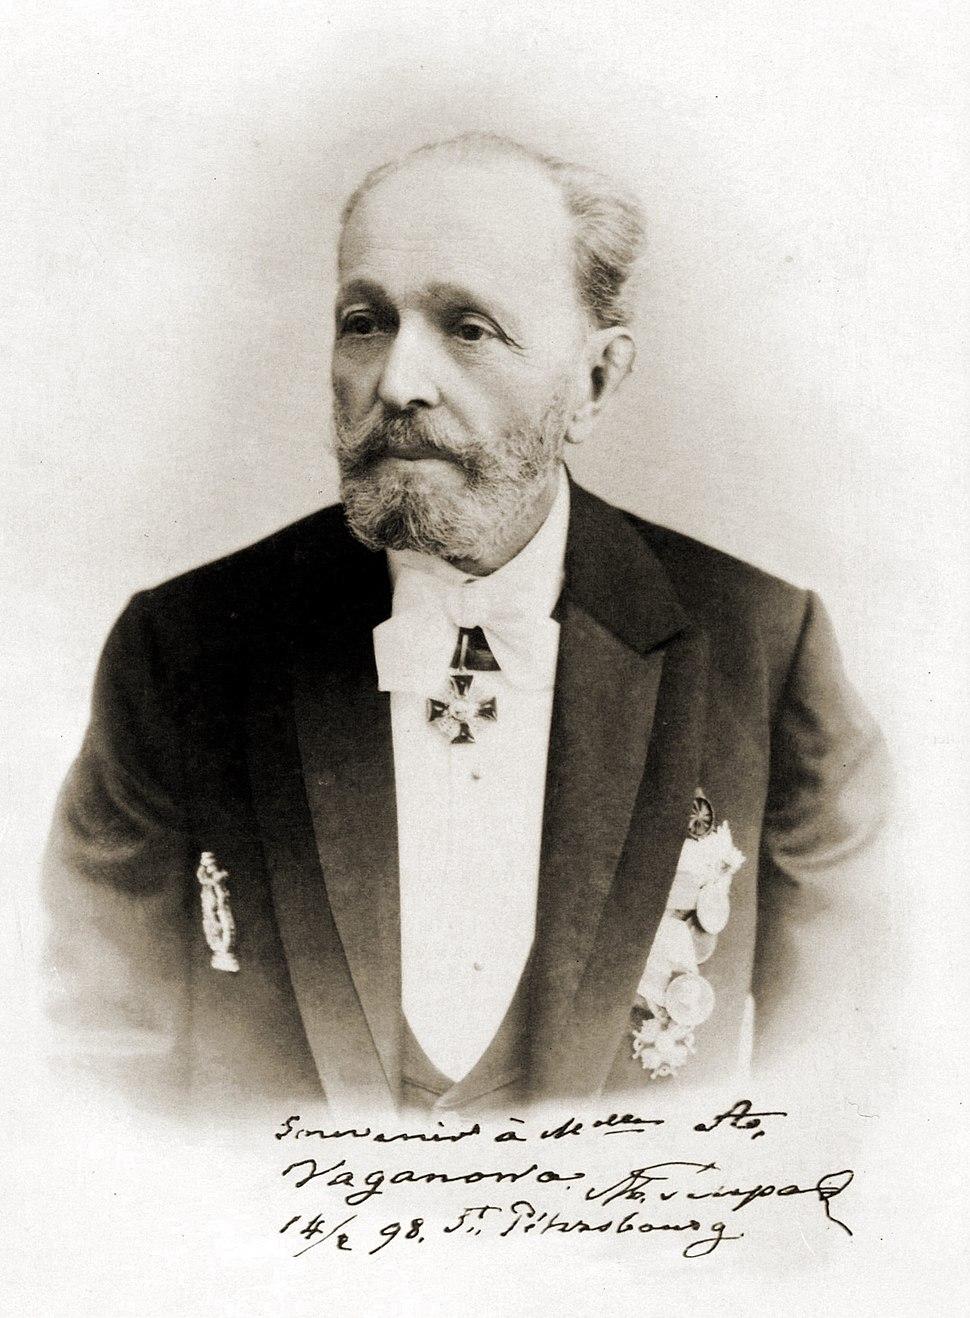 Marius Ivanovich Petipa -Feb. 14 1898